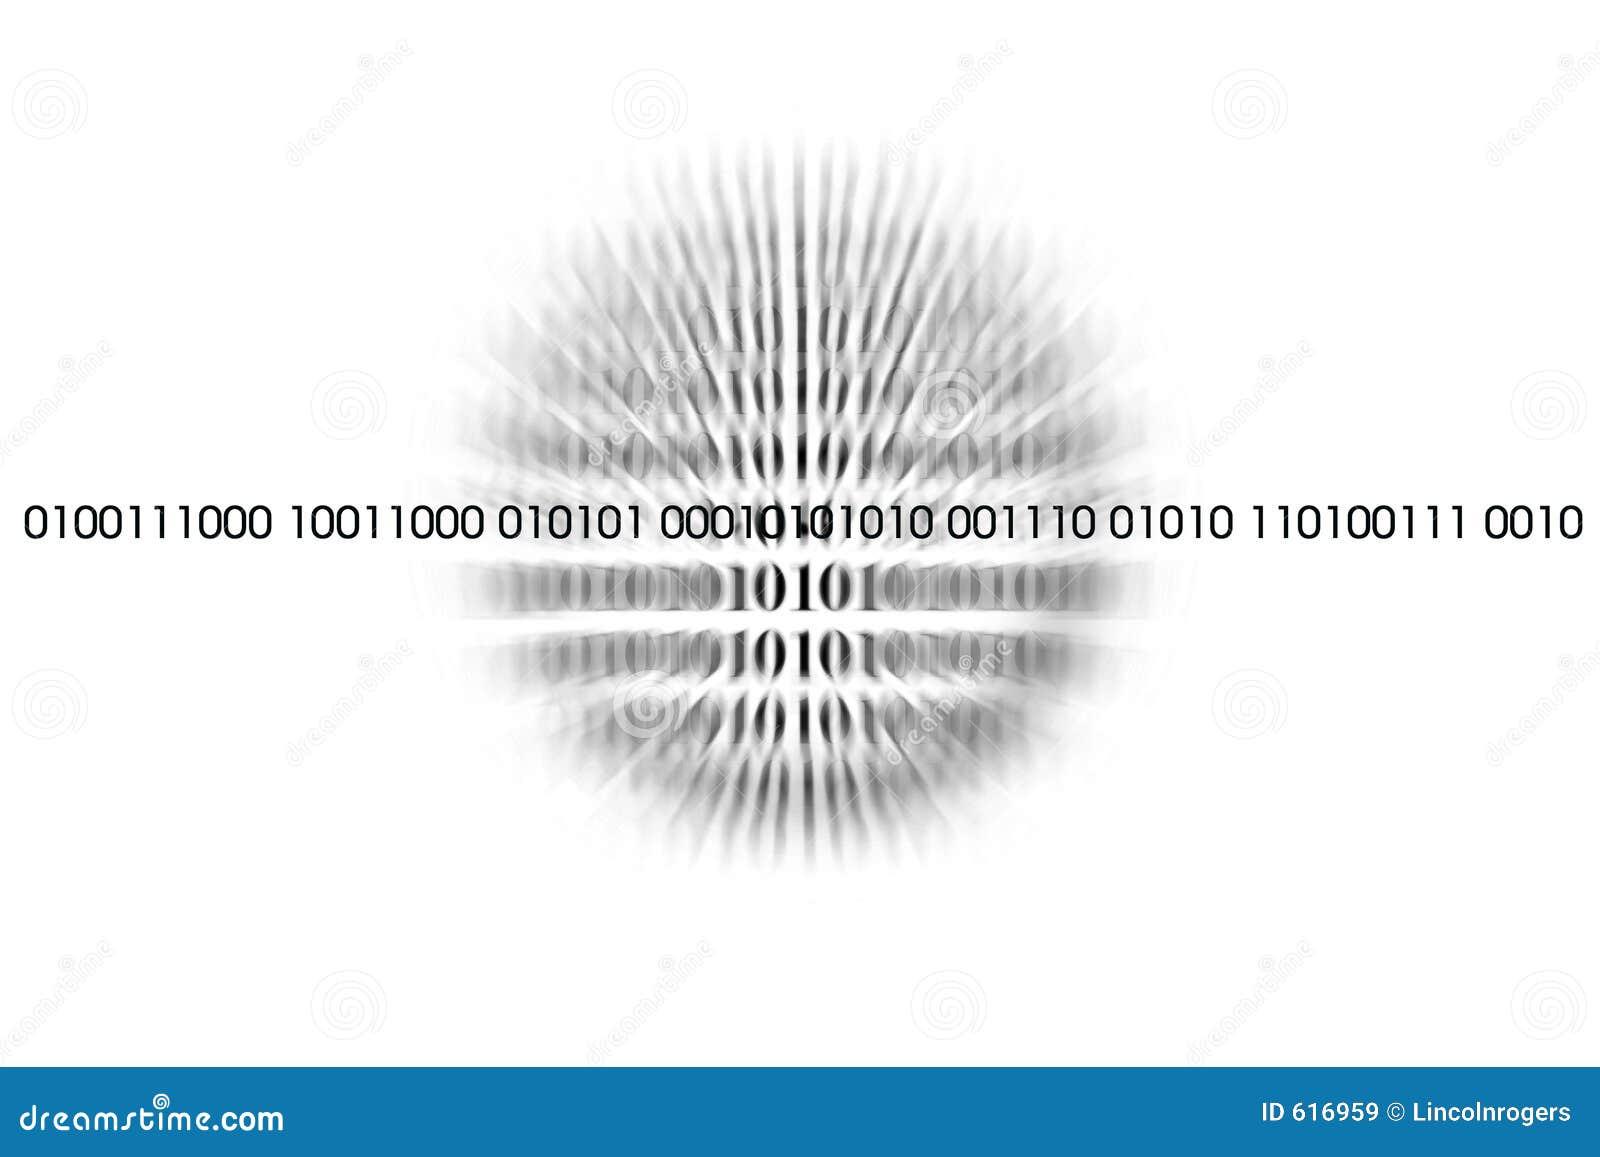 Código binario sobre blanco